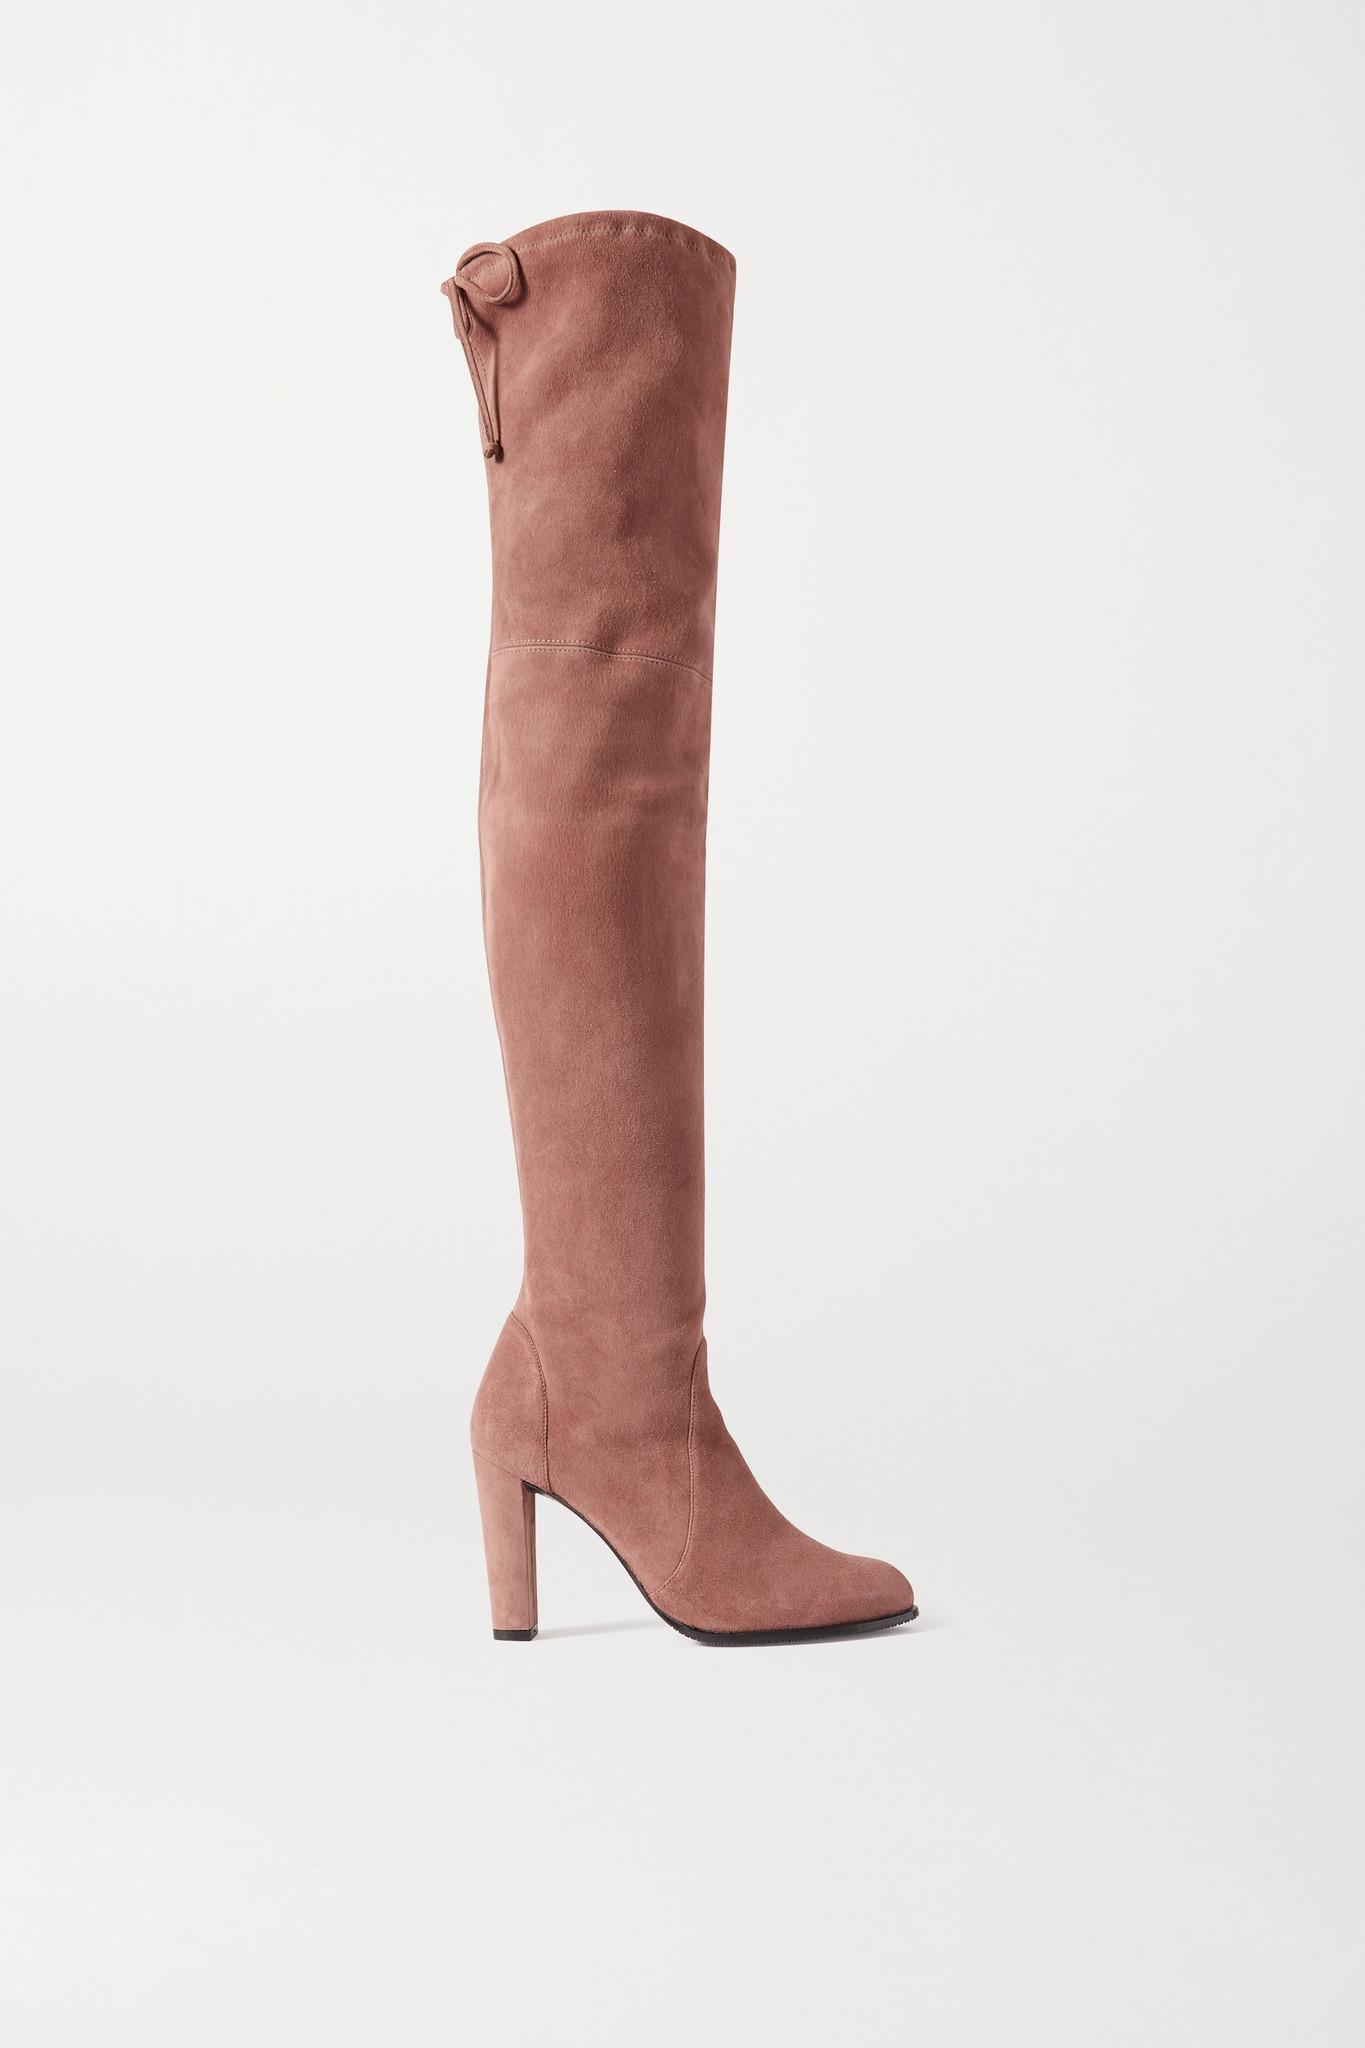 STUART WEITZMAN - Highland 弹力绒面革过膝长靴 - 棕色 - IT38